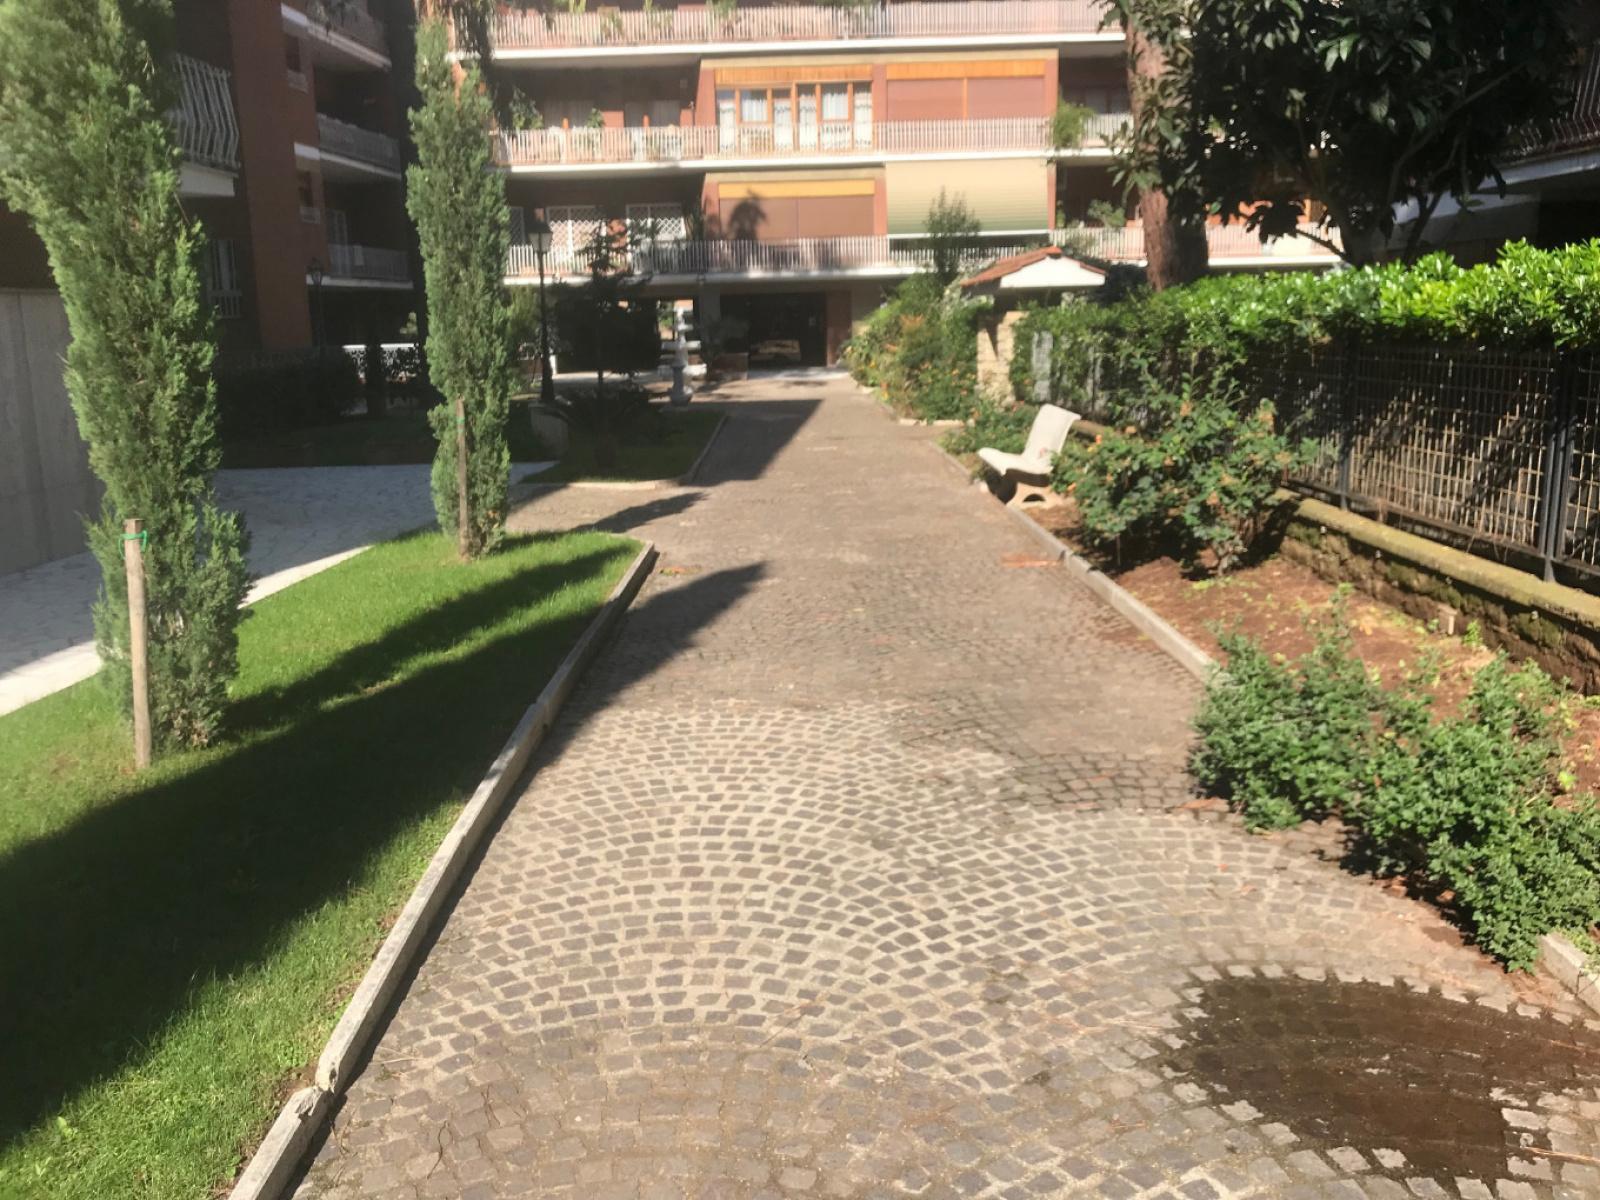 1118416965 Plurilocale (6) in Via Sestio Calvino, Roma, Zona Tuscolana, Appio Claudio